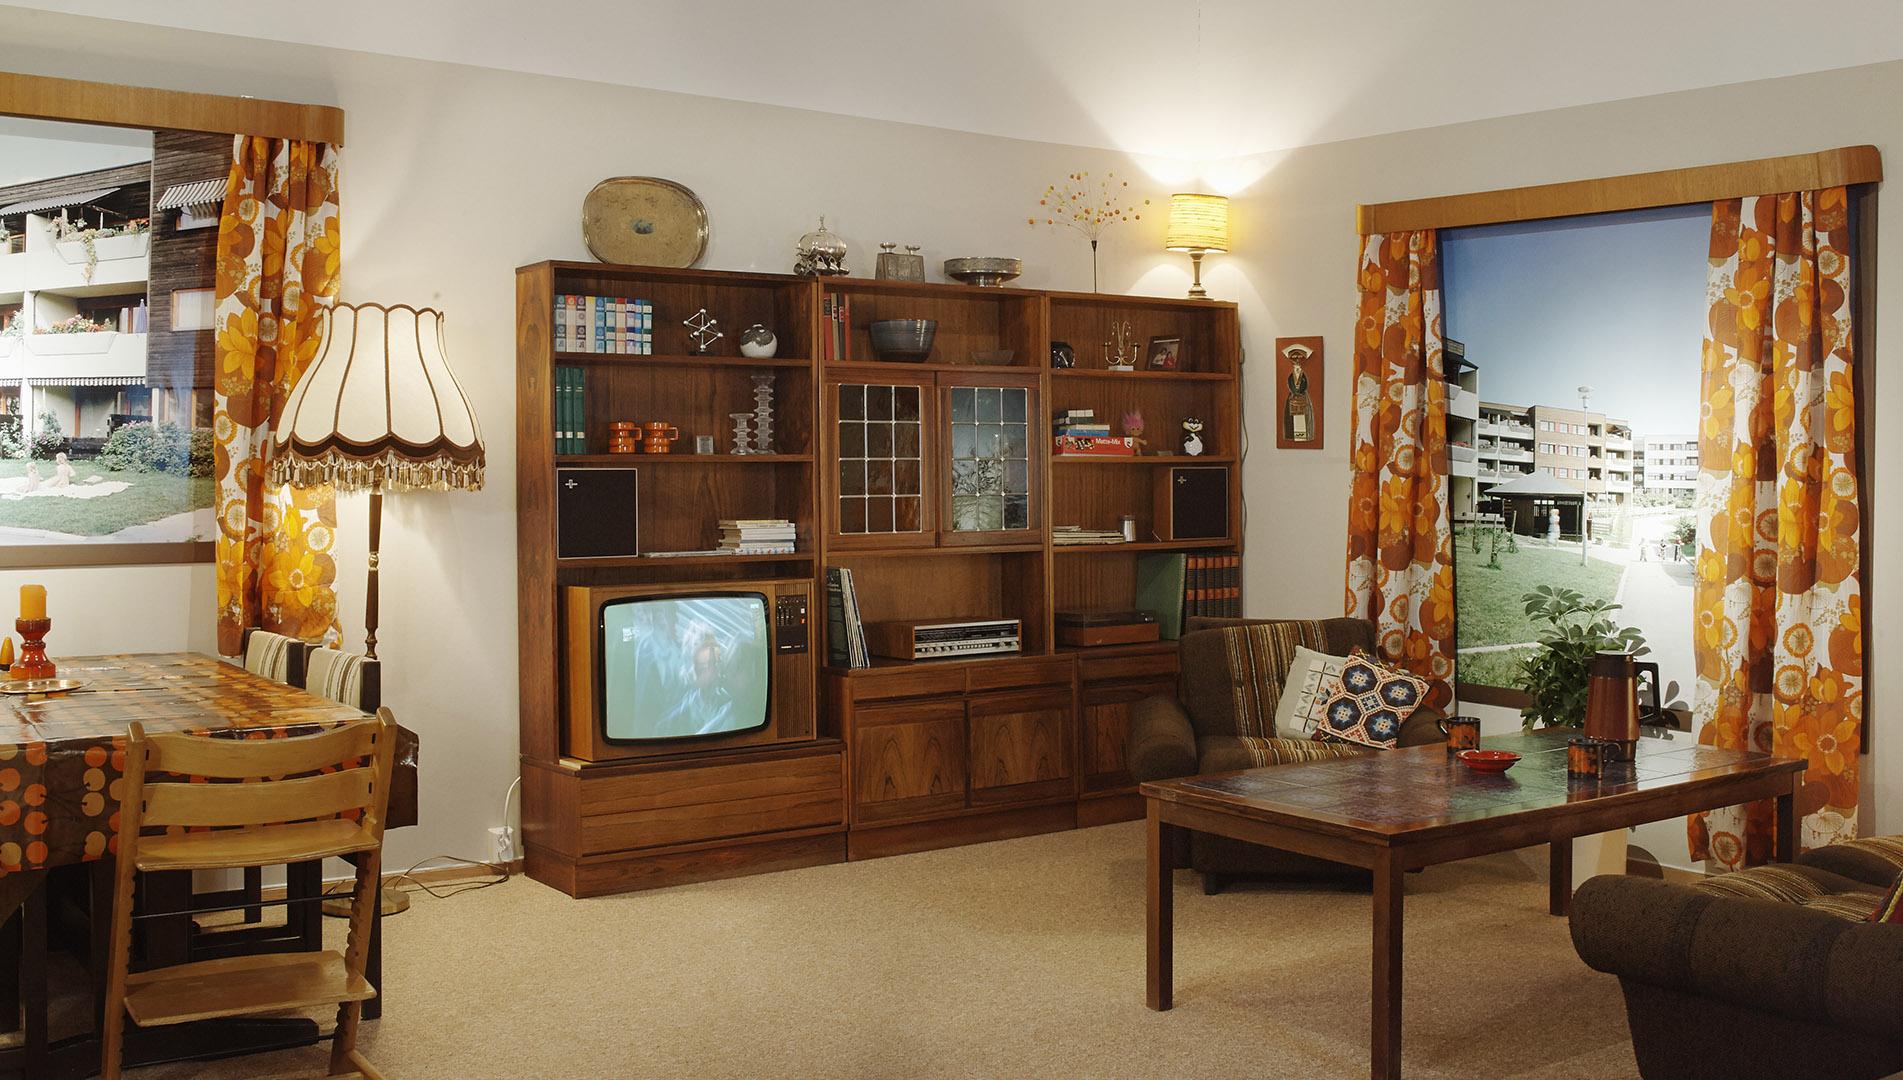 3_Museum of Oslo- A 70s living room-Rune Aakvik & Oslo Museum